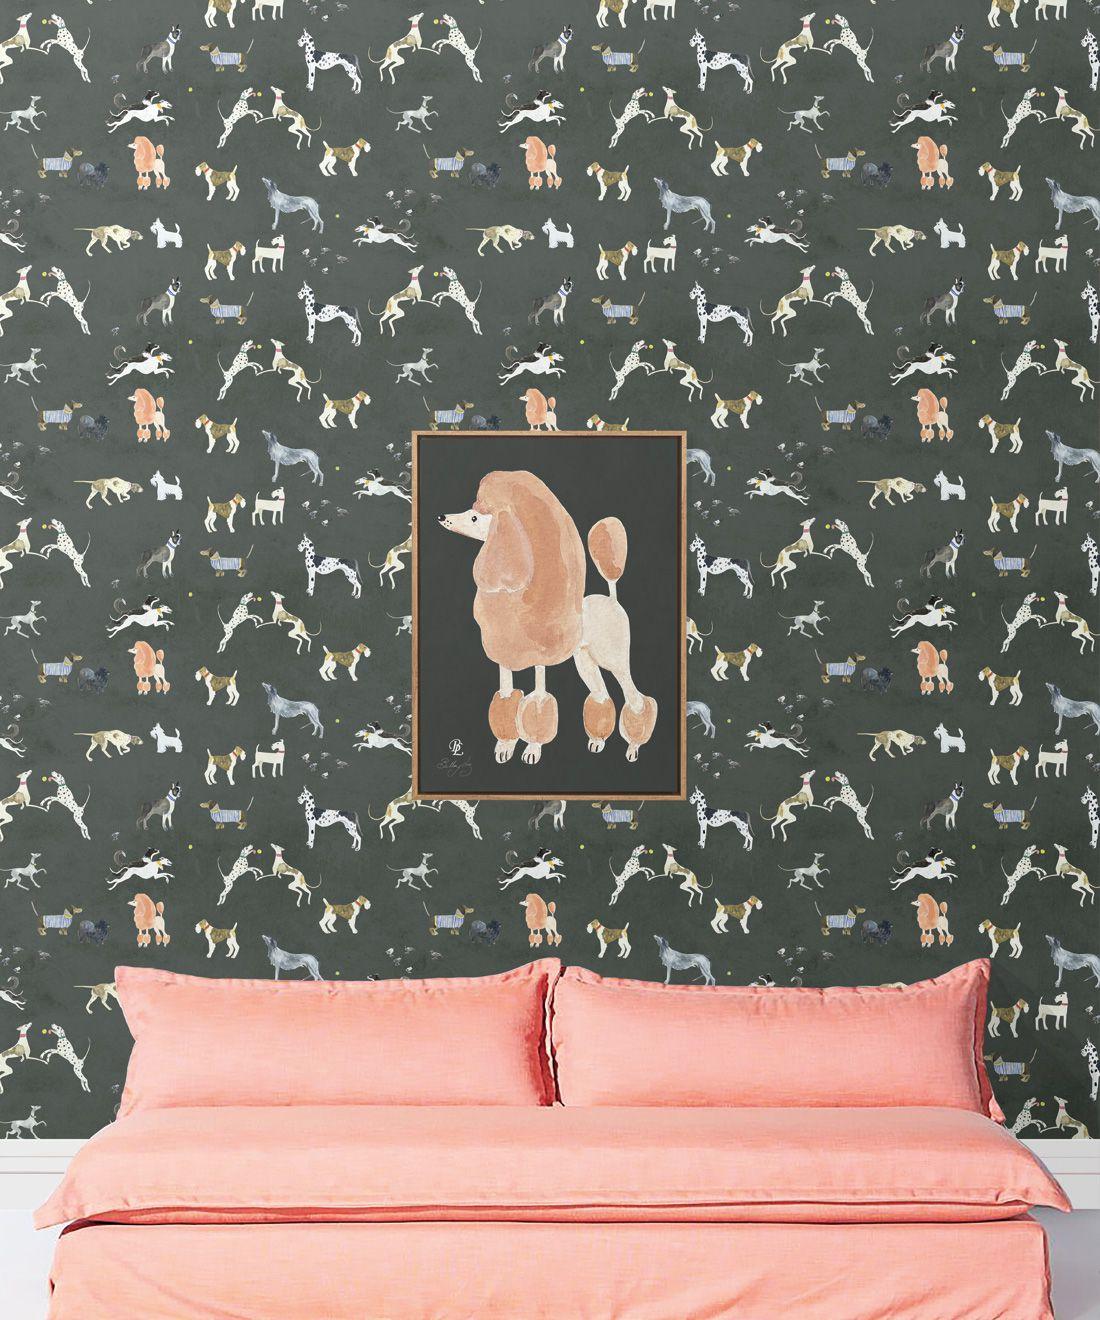 Doggies Wallpaper •Dog Wallpaper •Charcoal • Insitu with Sofa